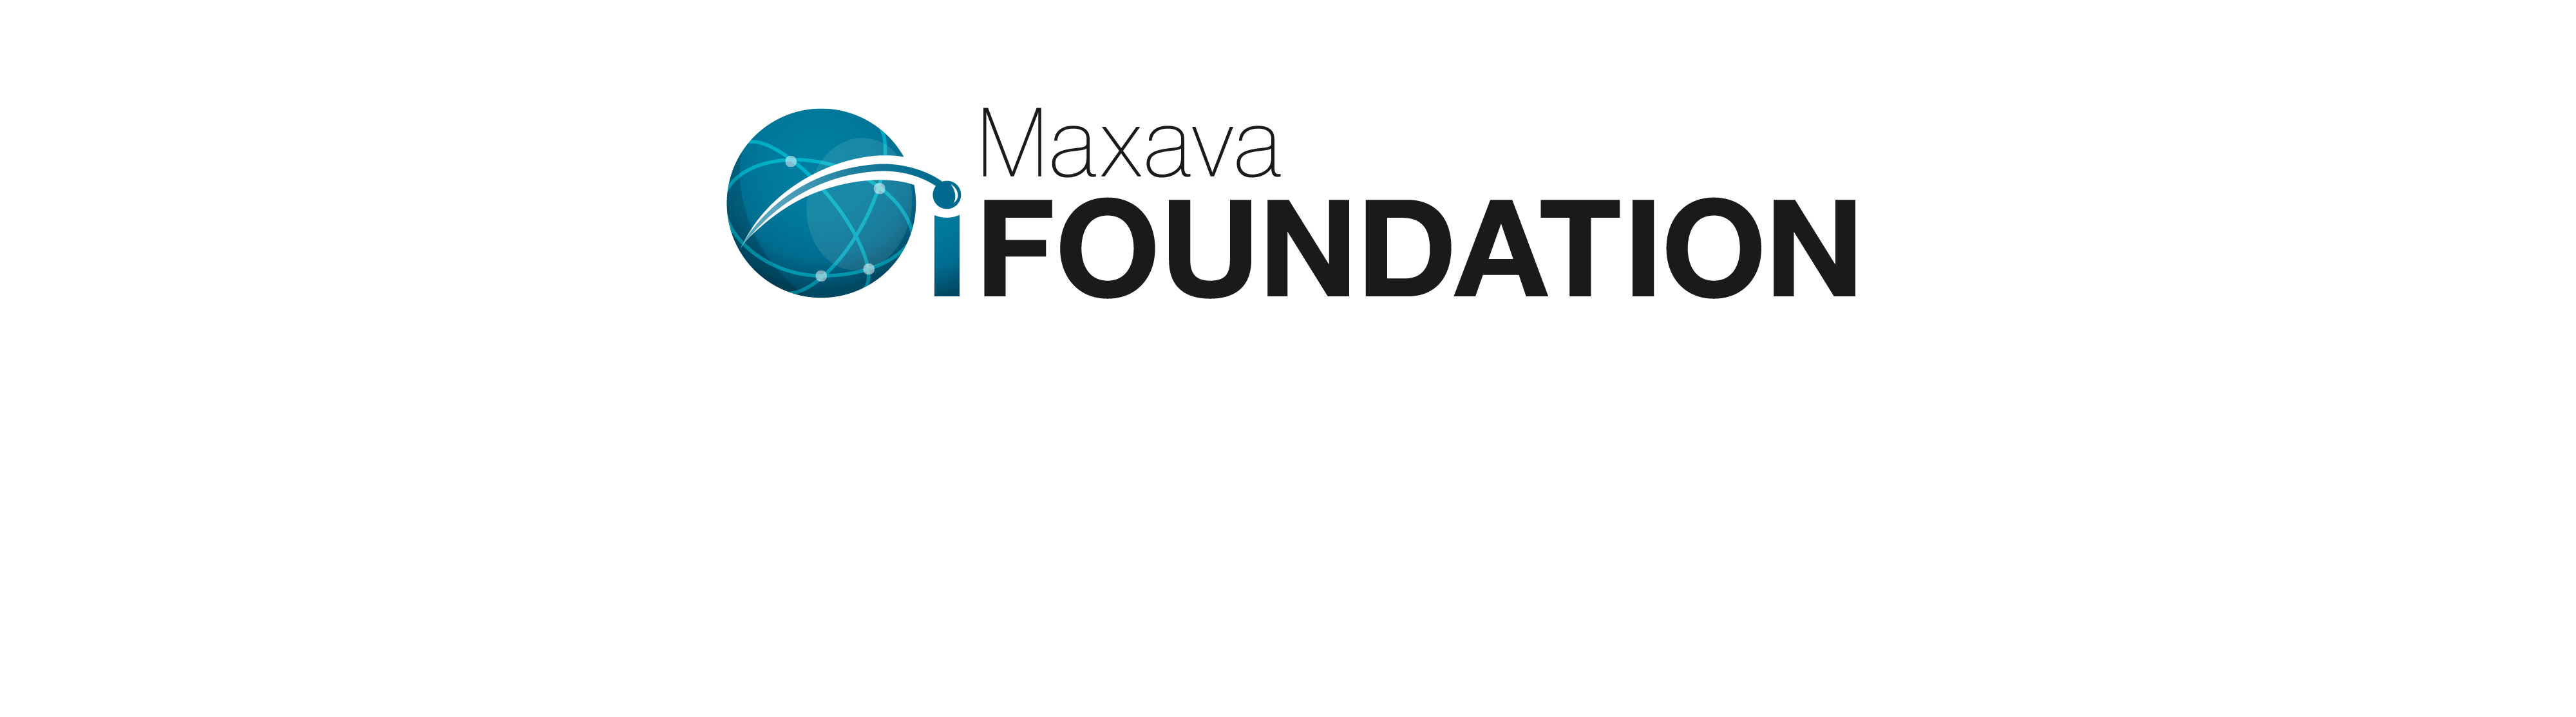 "iFoundation-logo""/"